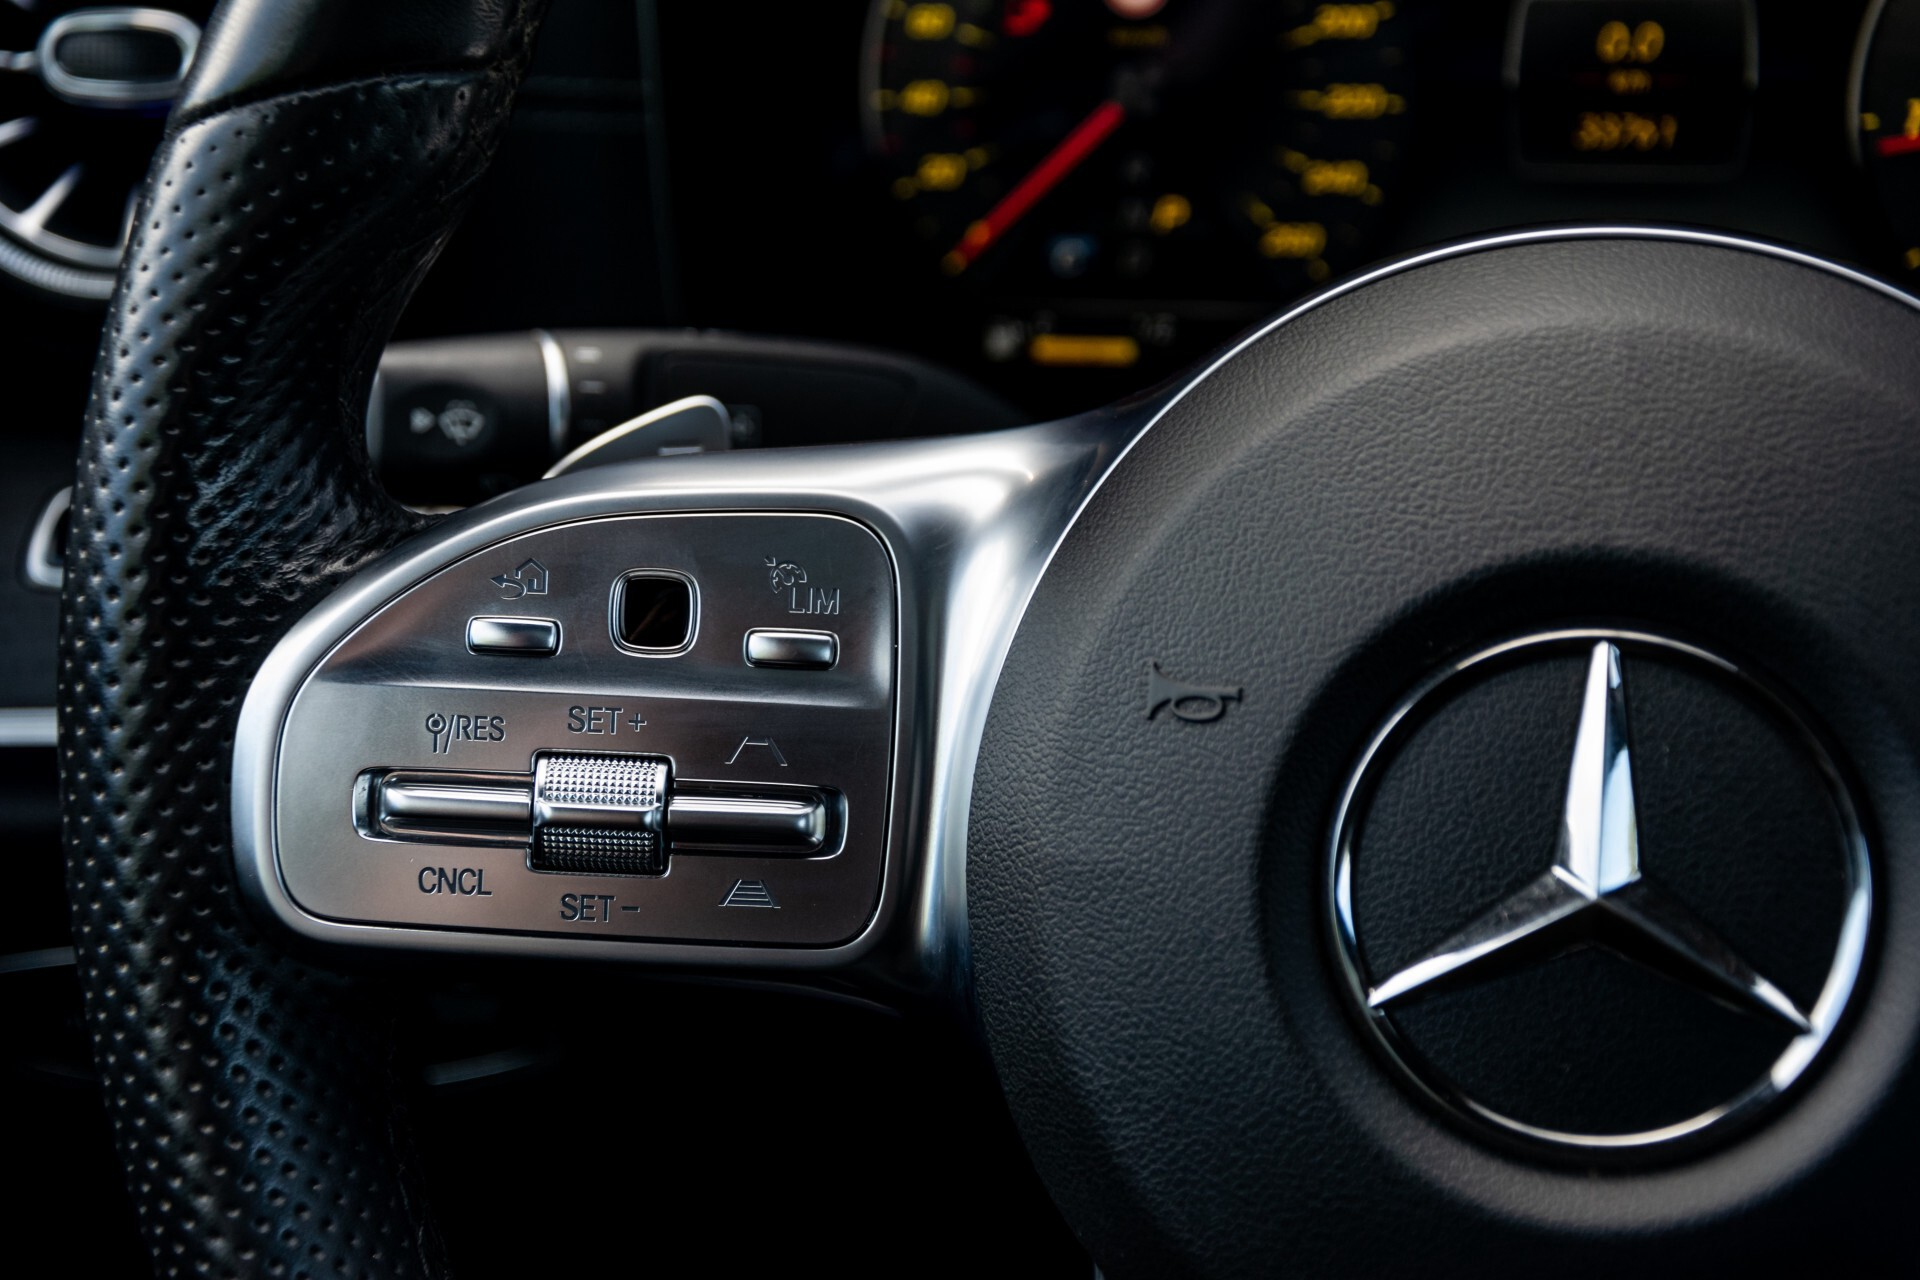 Mercedes-Benz E-Klasse Coupé 300 AMG Panorama/Rij-assist/Keyless/Massage/Memory/HUD/Standkachel/Night Aut9 Foto 10